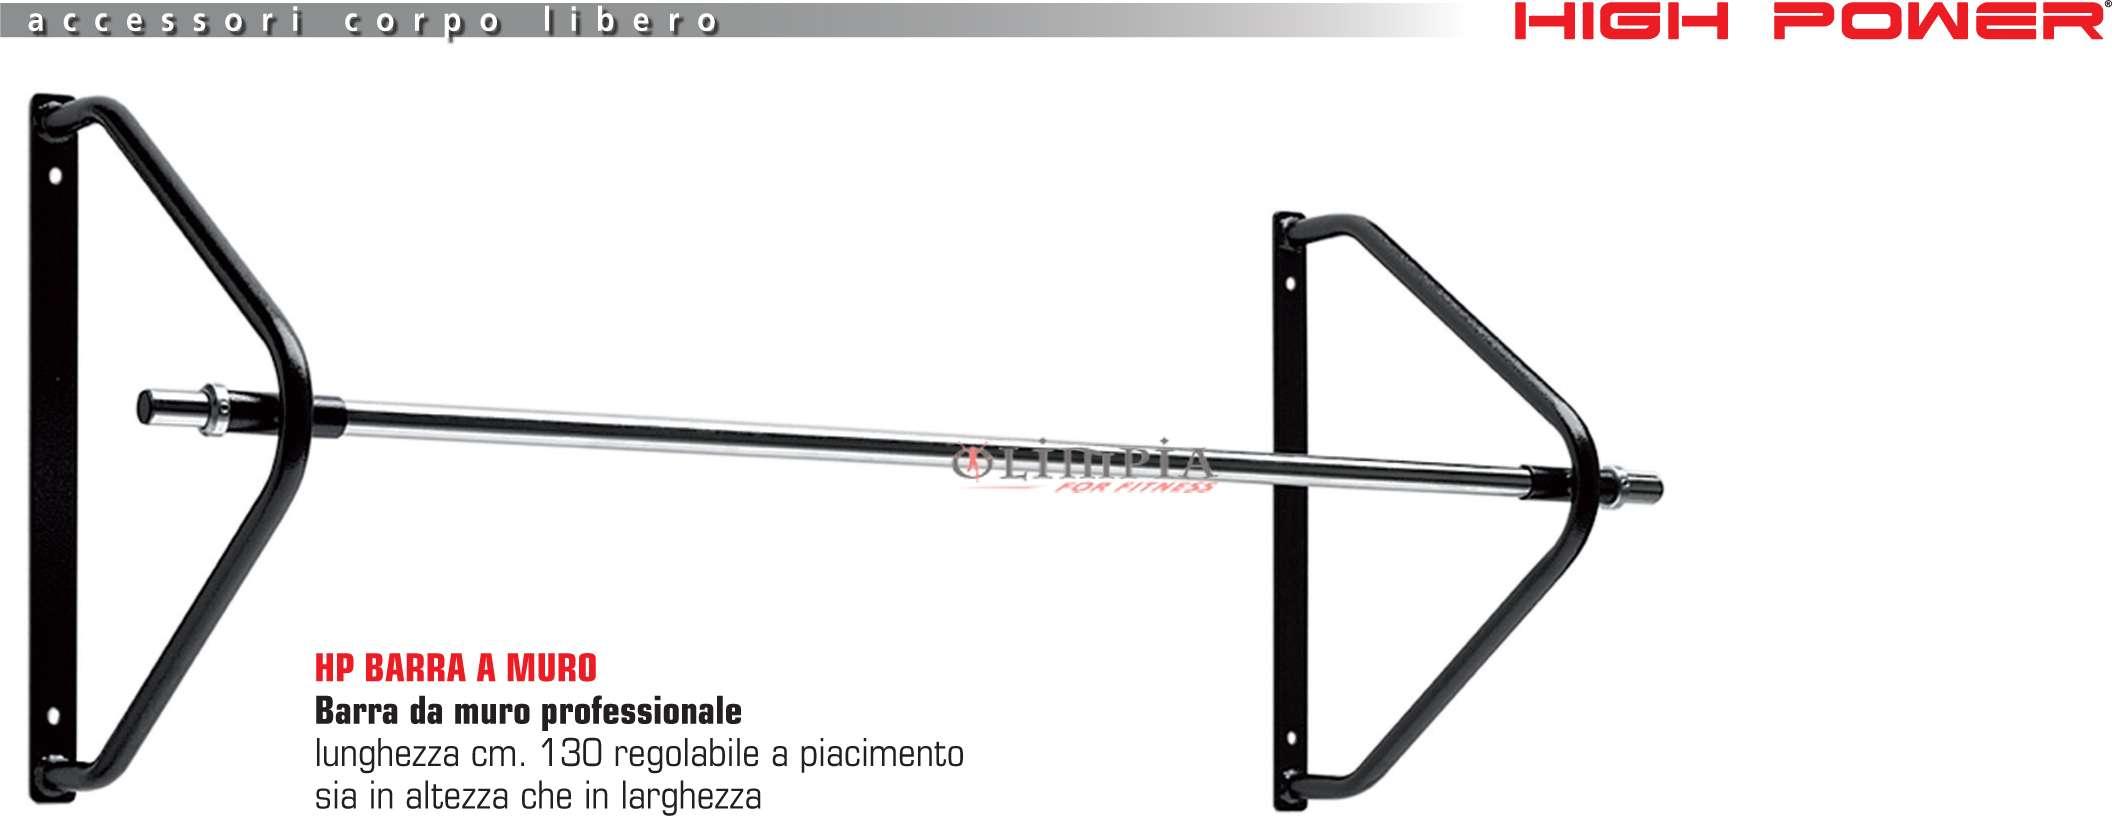 HIGH POWER - BARRA / SBARRA FISSA a MURO Professionale per TRAZIONI - L. 130c...